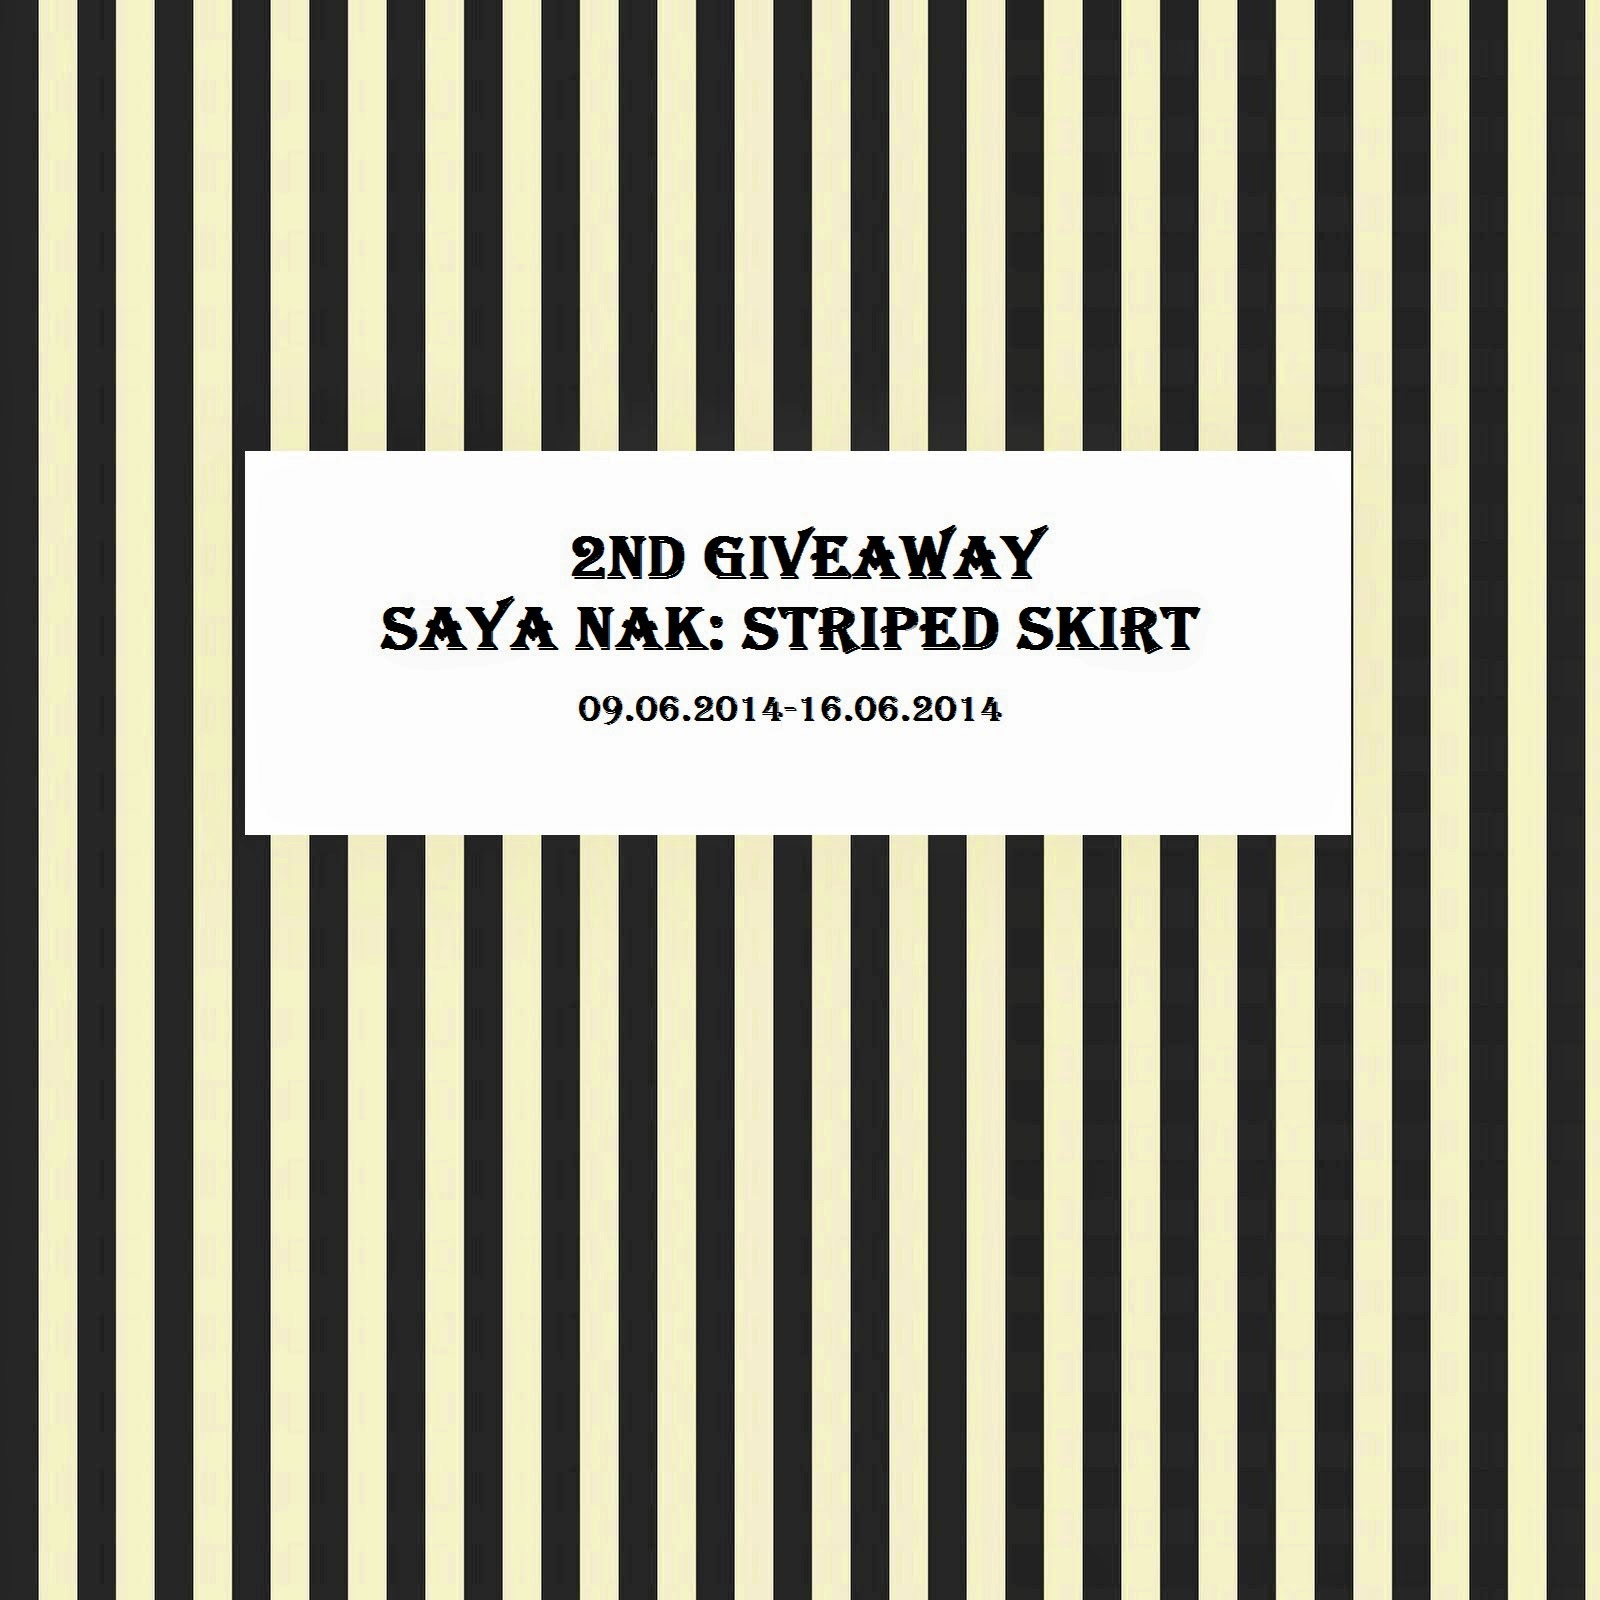 http://kasutkaca15.blogspot.com/2014/06/2nd-giveaway-saya-nak-striped-skirt.html